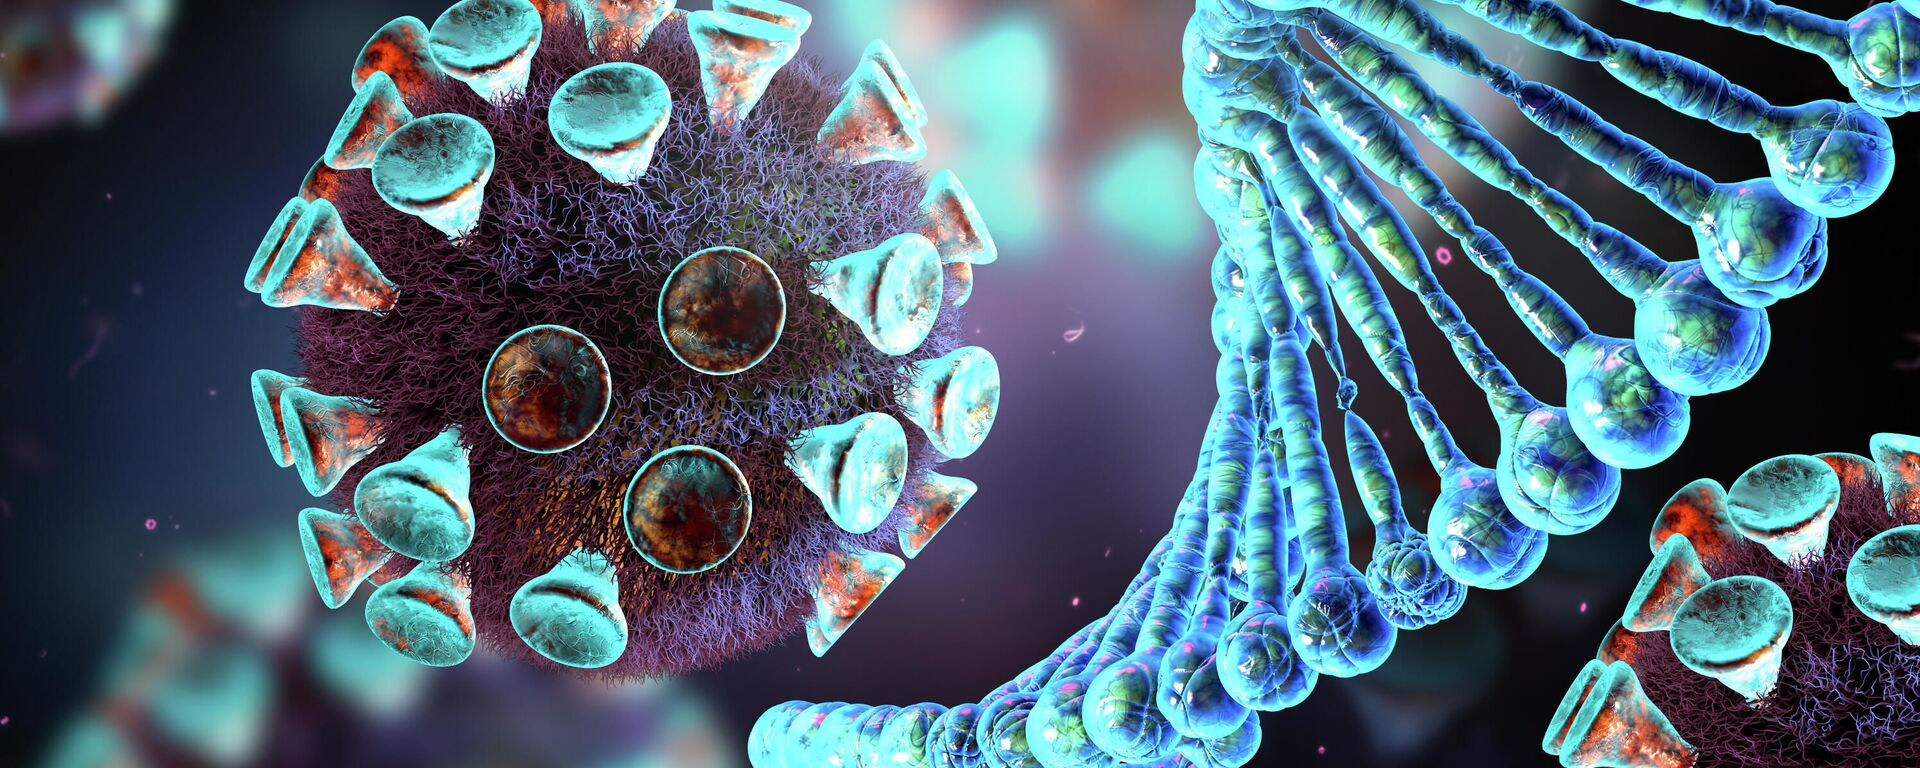 Molecola di coronavirus - Sputnik Italia, 1920, 06.06.2021